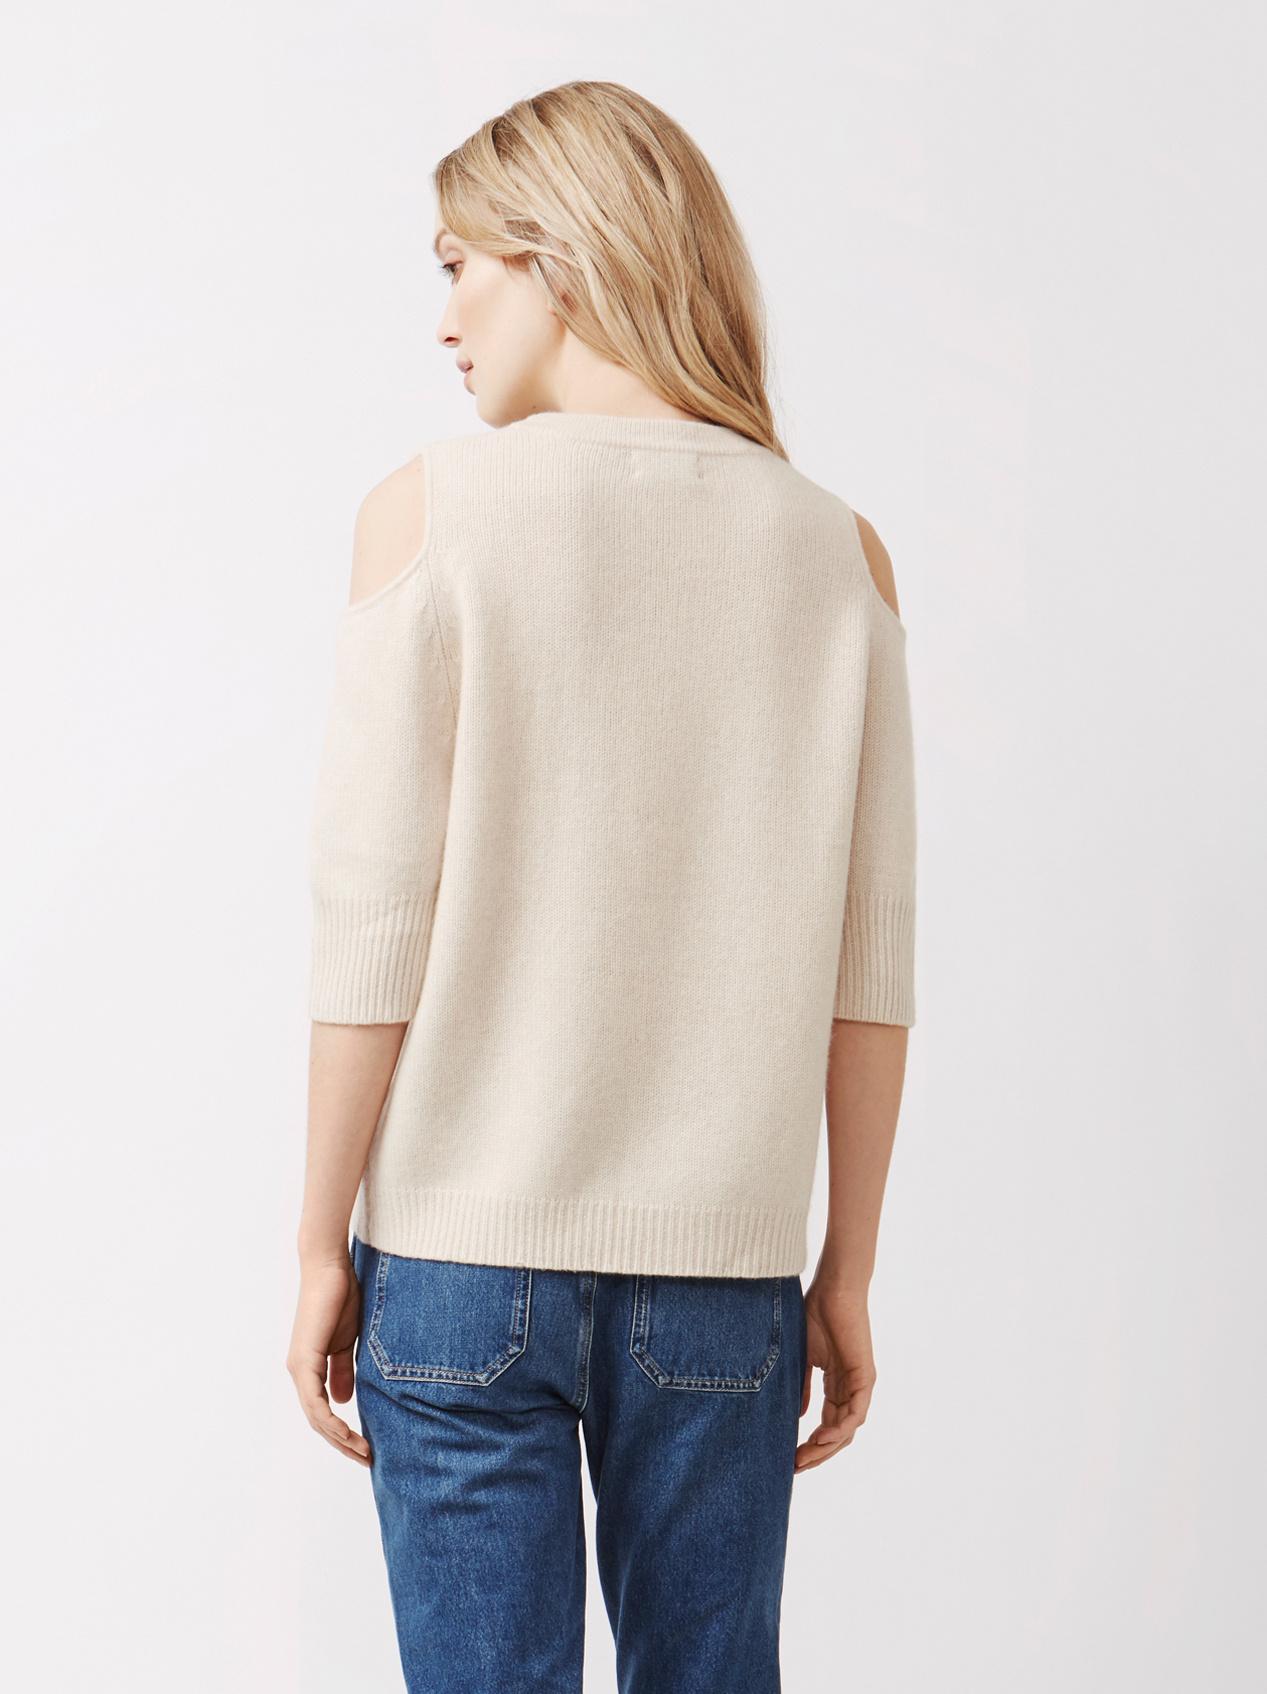 Soft Goat Women's Cold Shoulder Sweater Beige